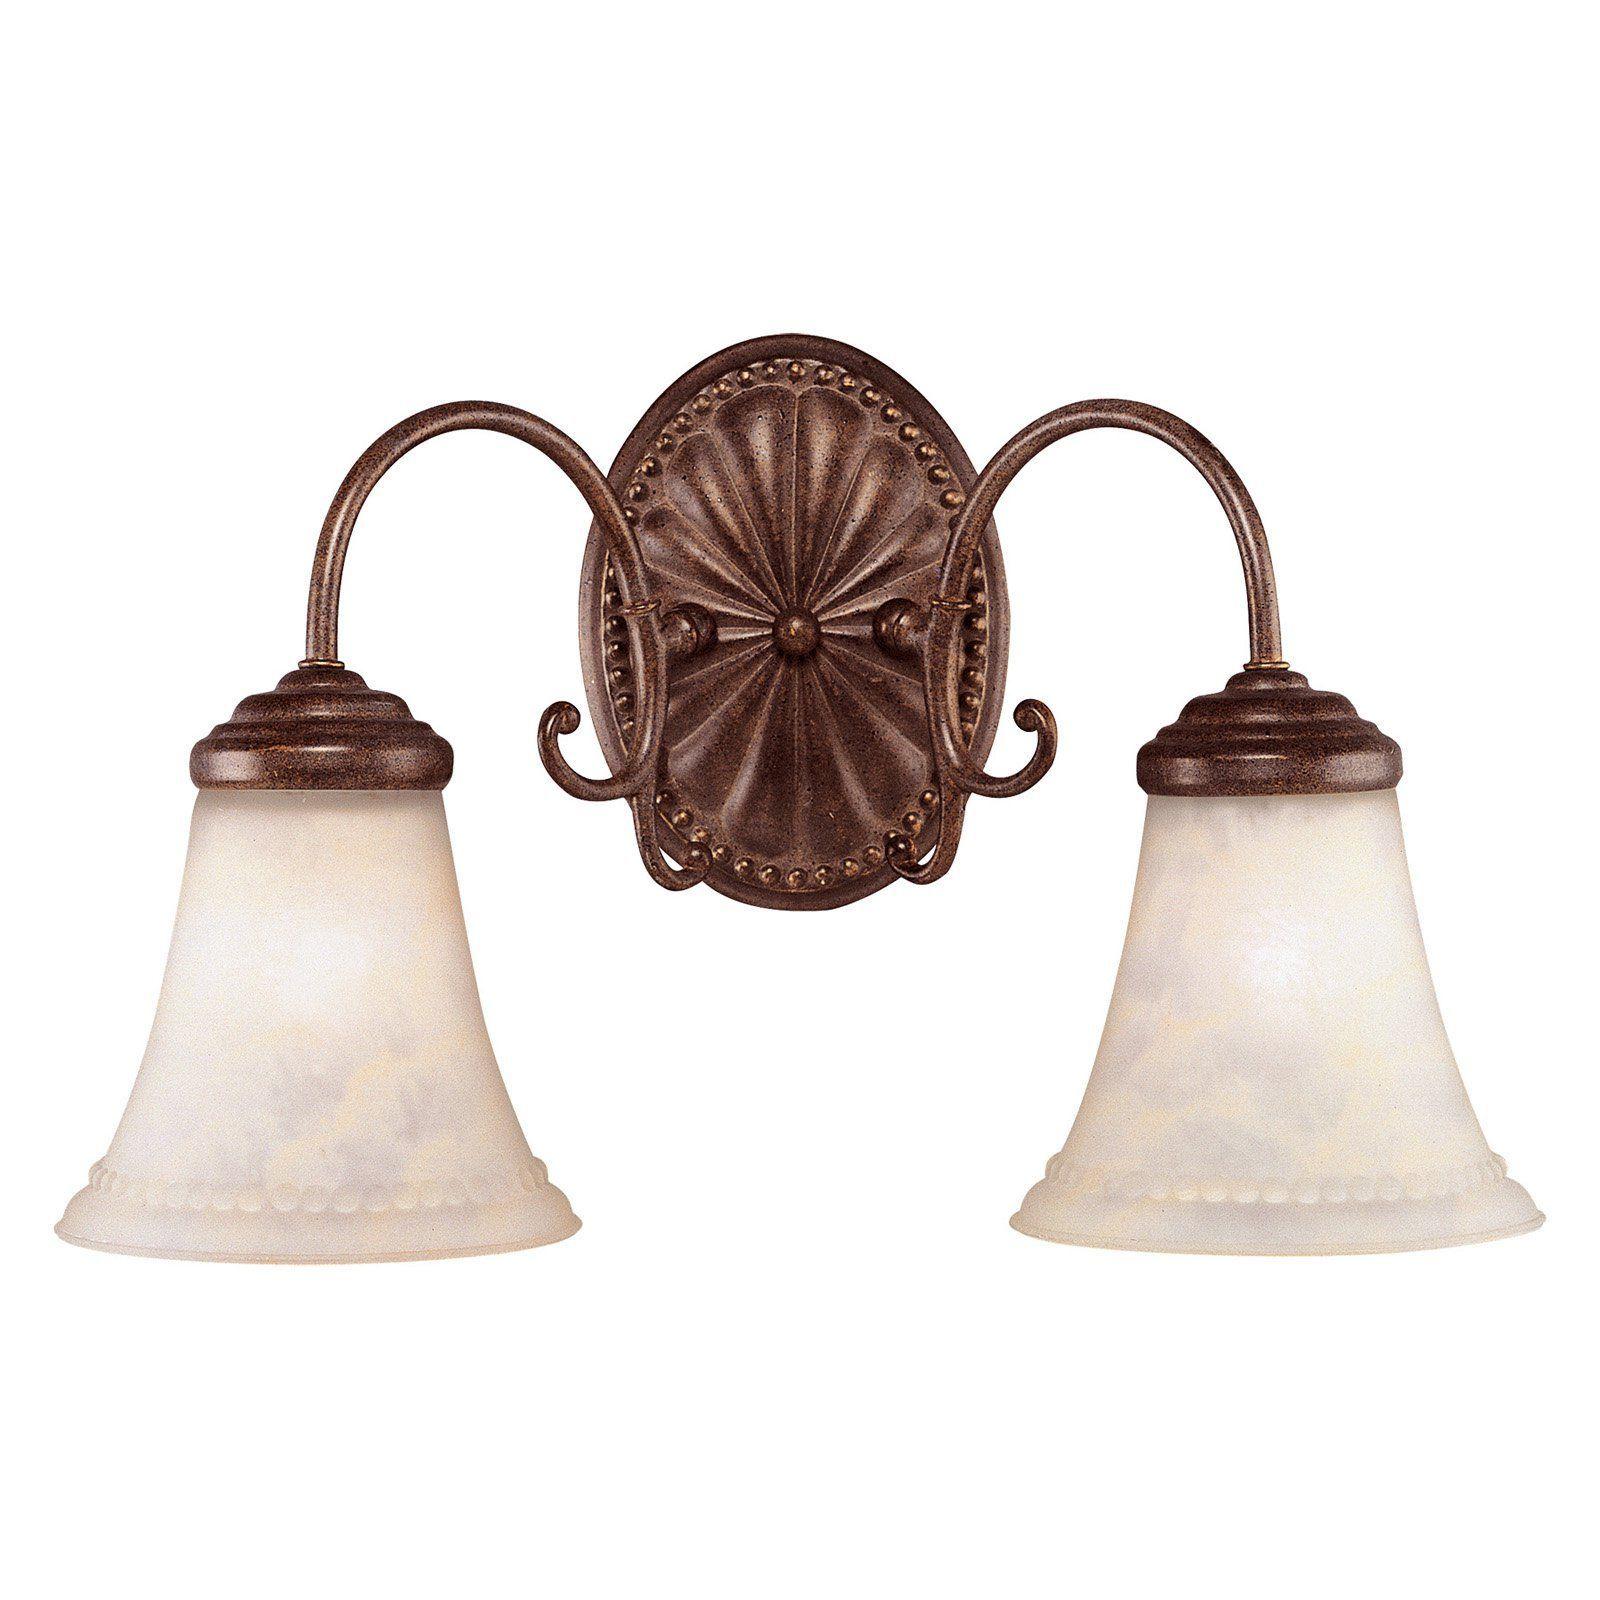 Savoy House Liberty KP-8-510-2-40 Bathroom Vanity Light - KP-8-510-2-40